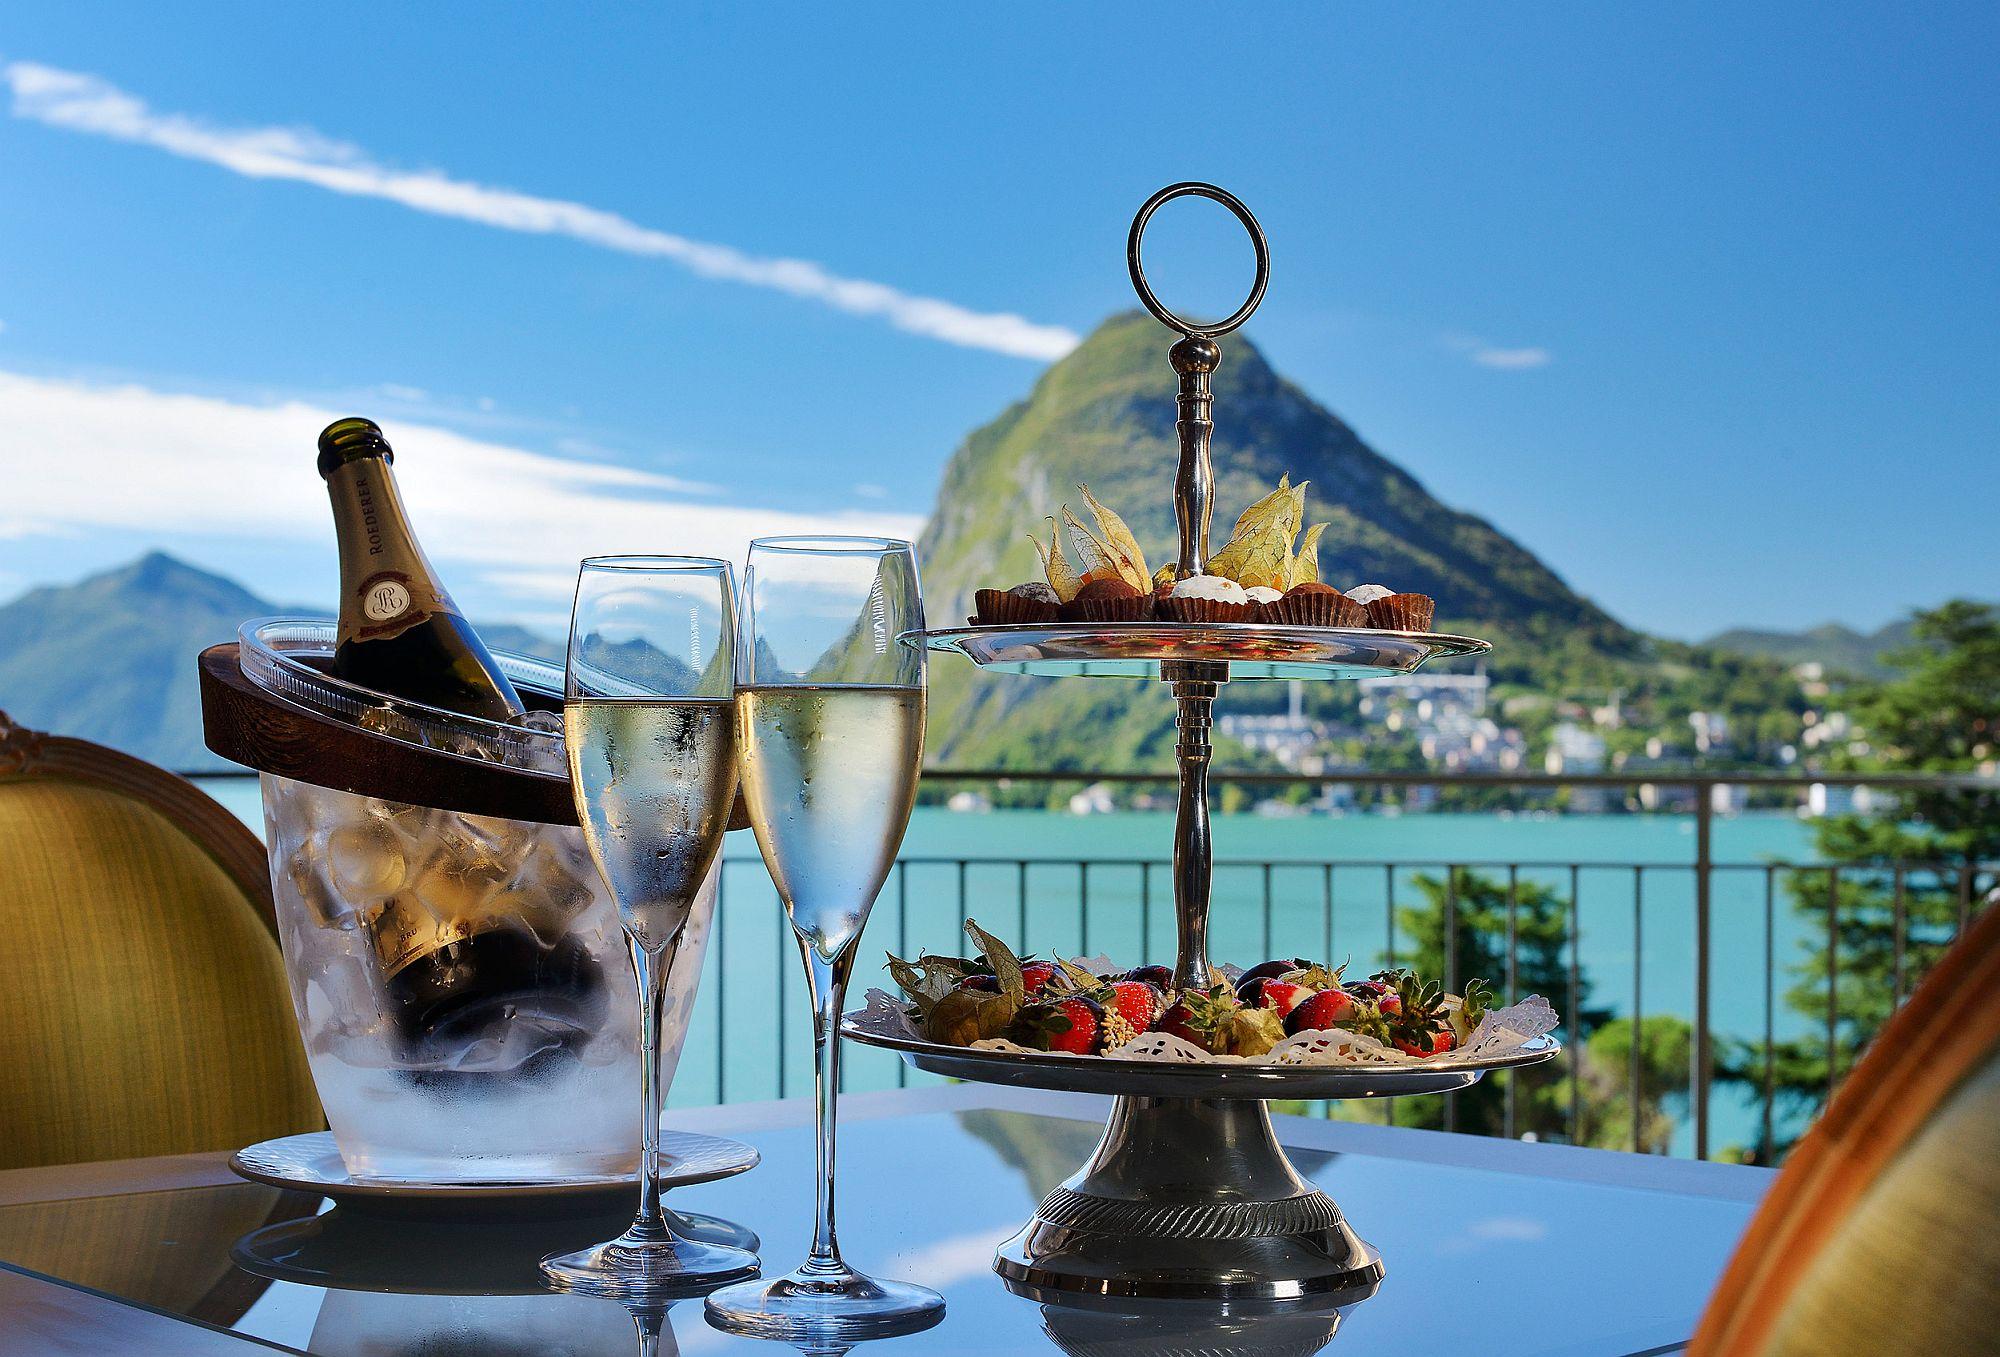 Enjoy the best of Swiss ski slopes at Villa Castagnola Grand Hotel Lugano